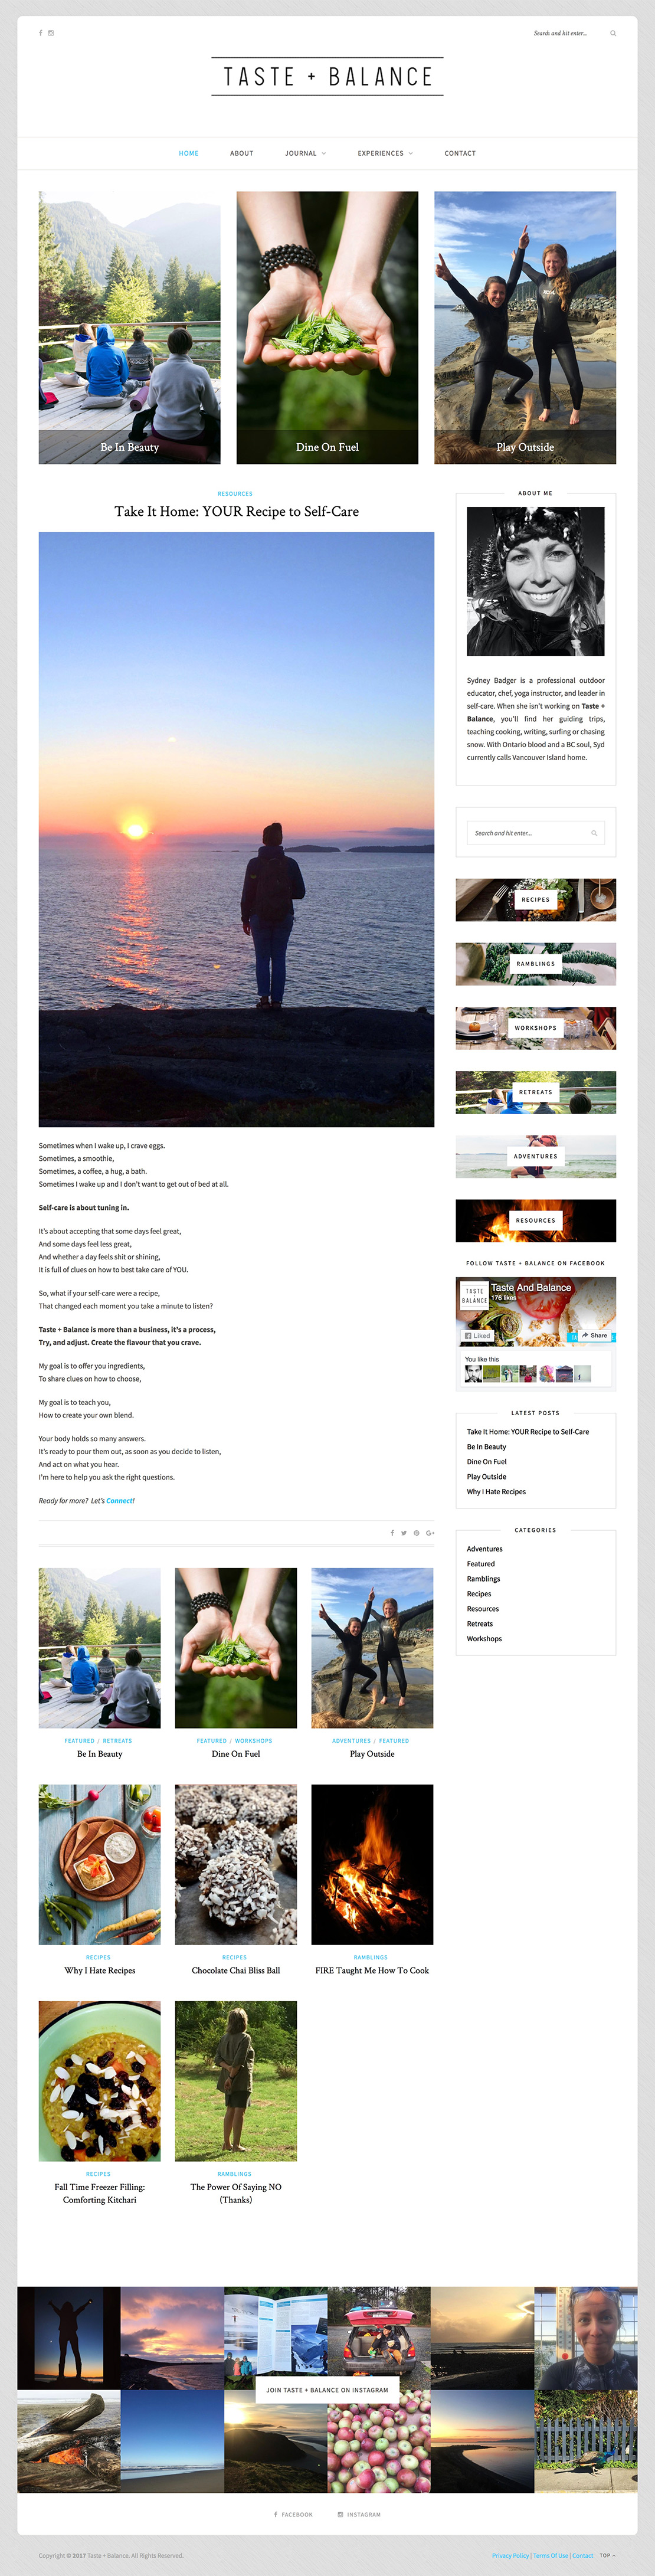 Taste + Balance Web Site